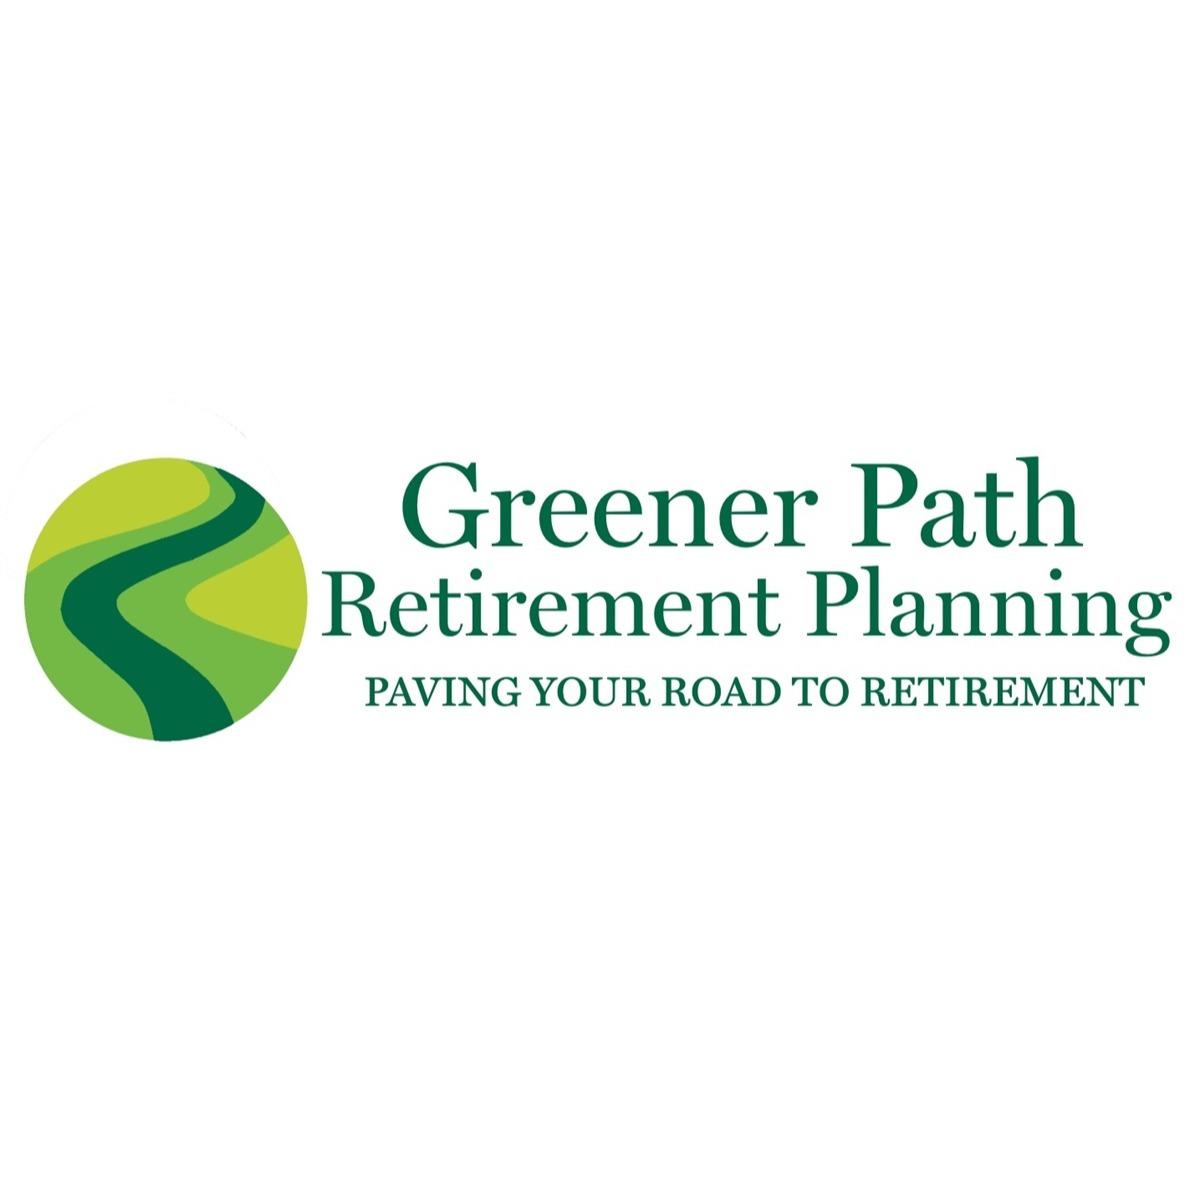 Greener Path Retirement Planning